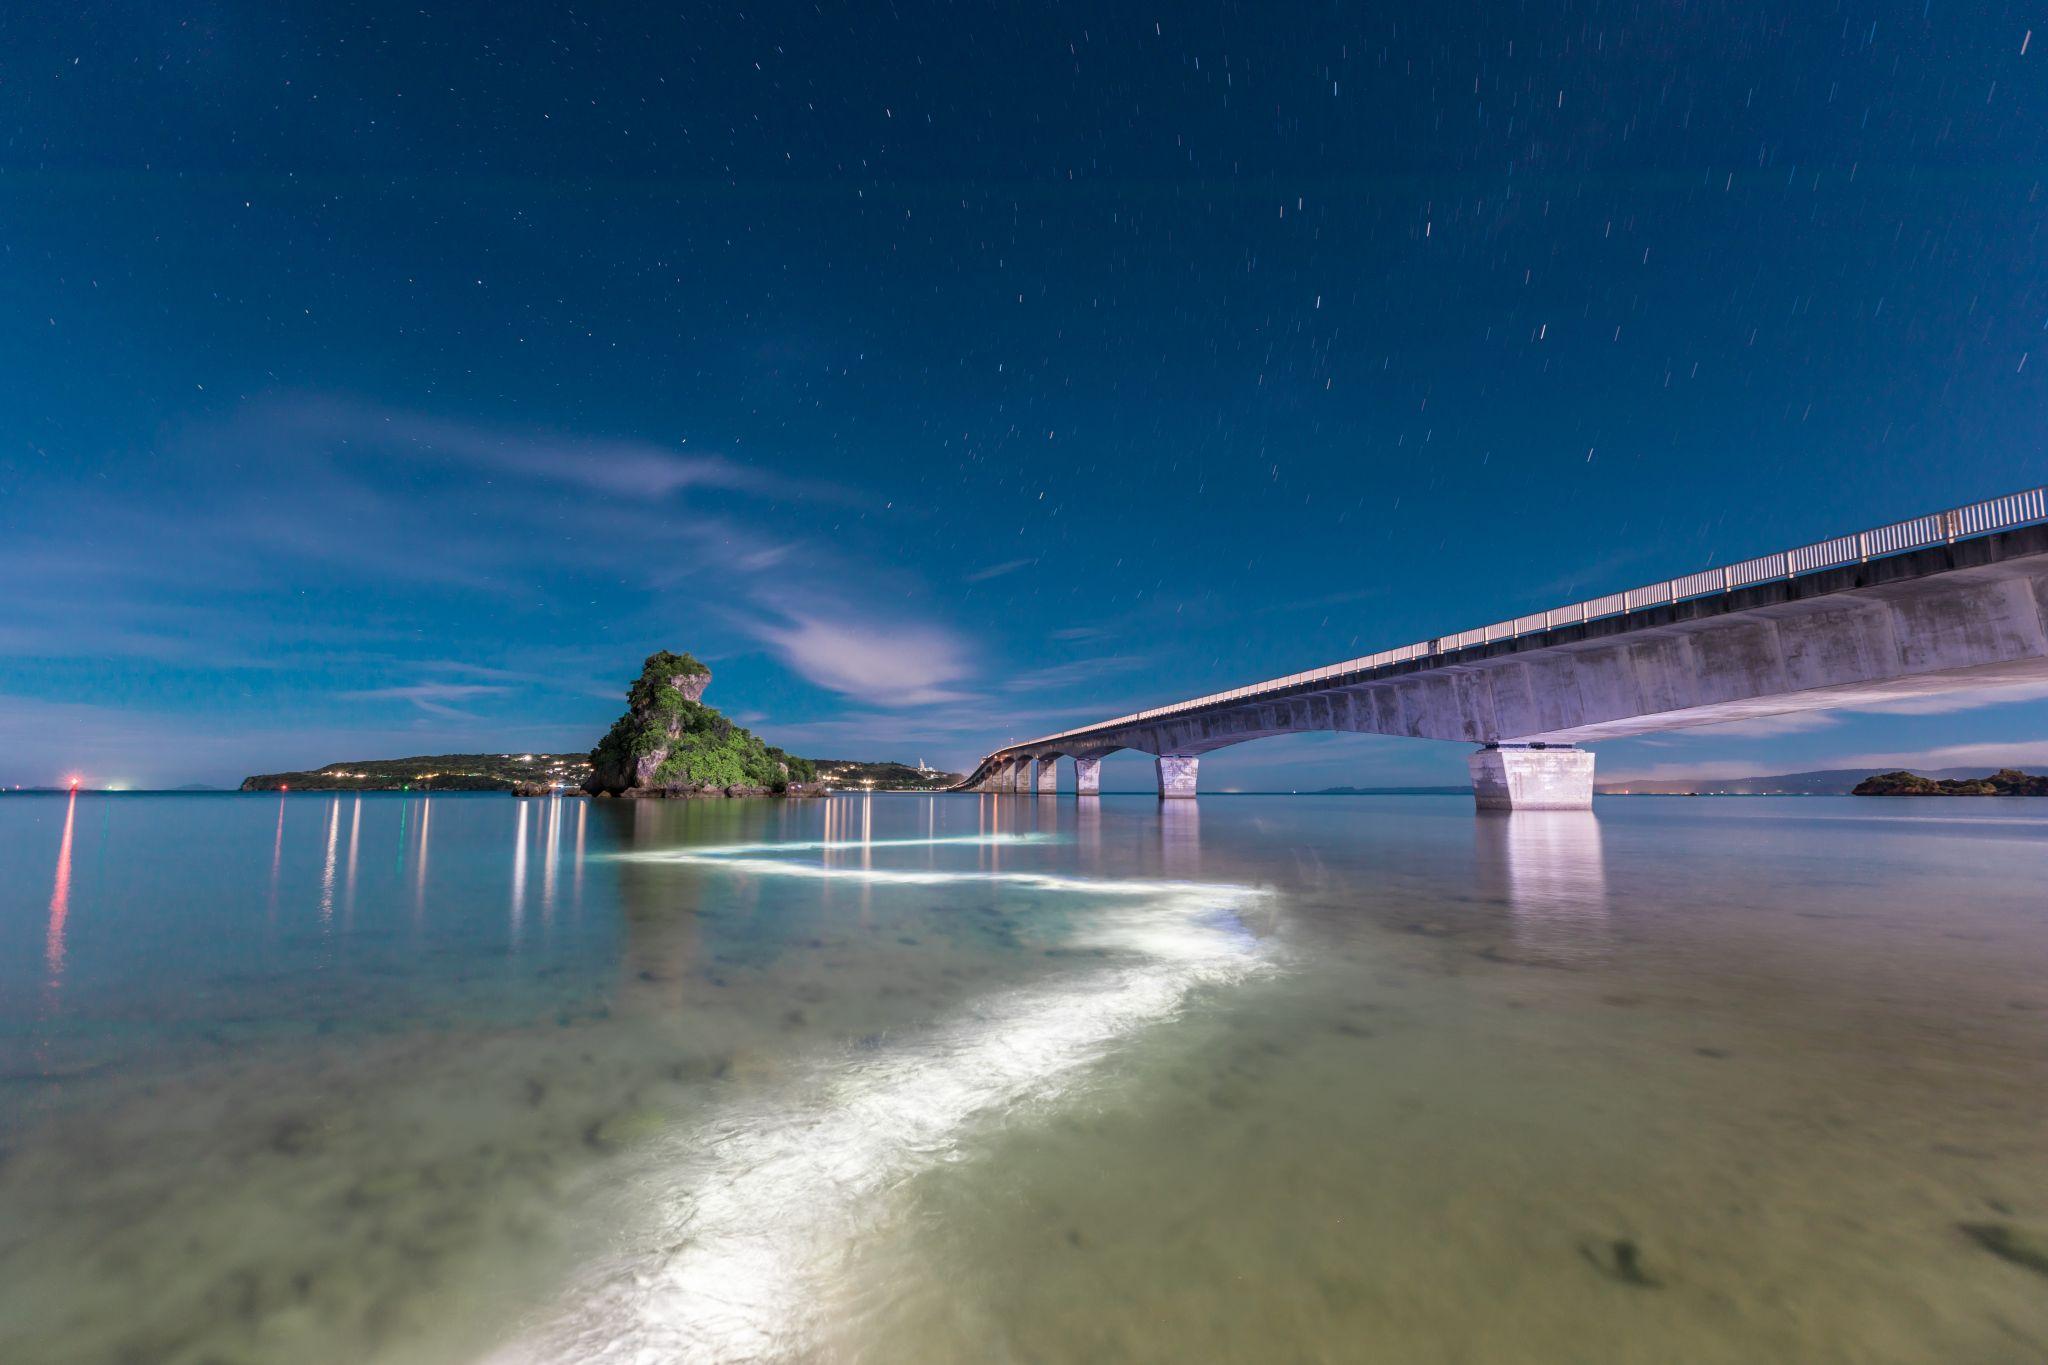 Bridge to Kouri Island, Japan